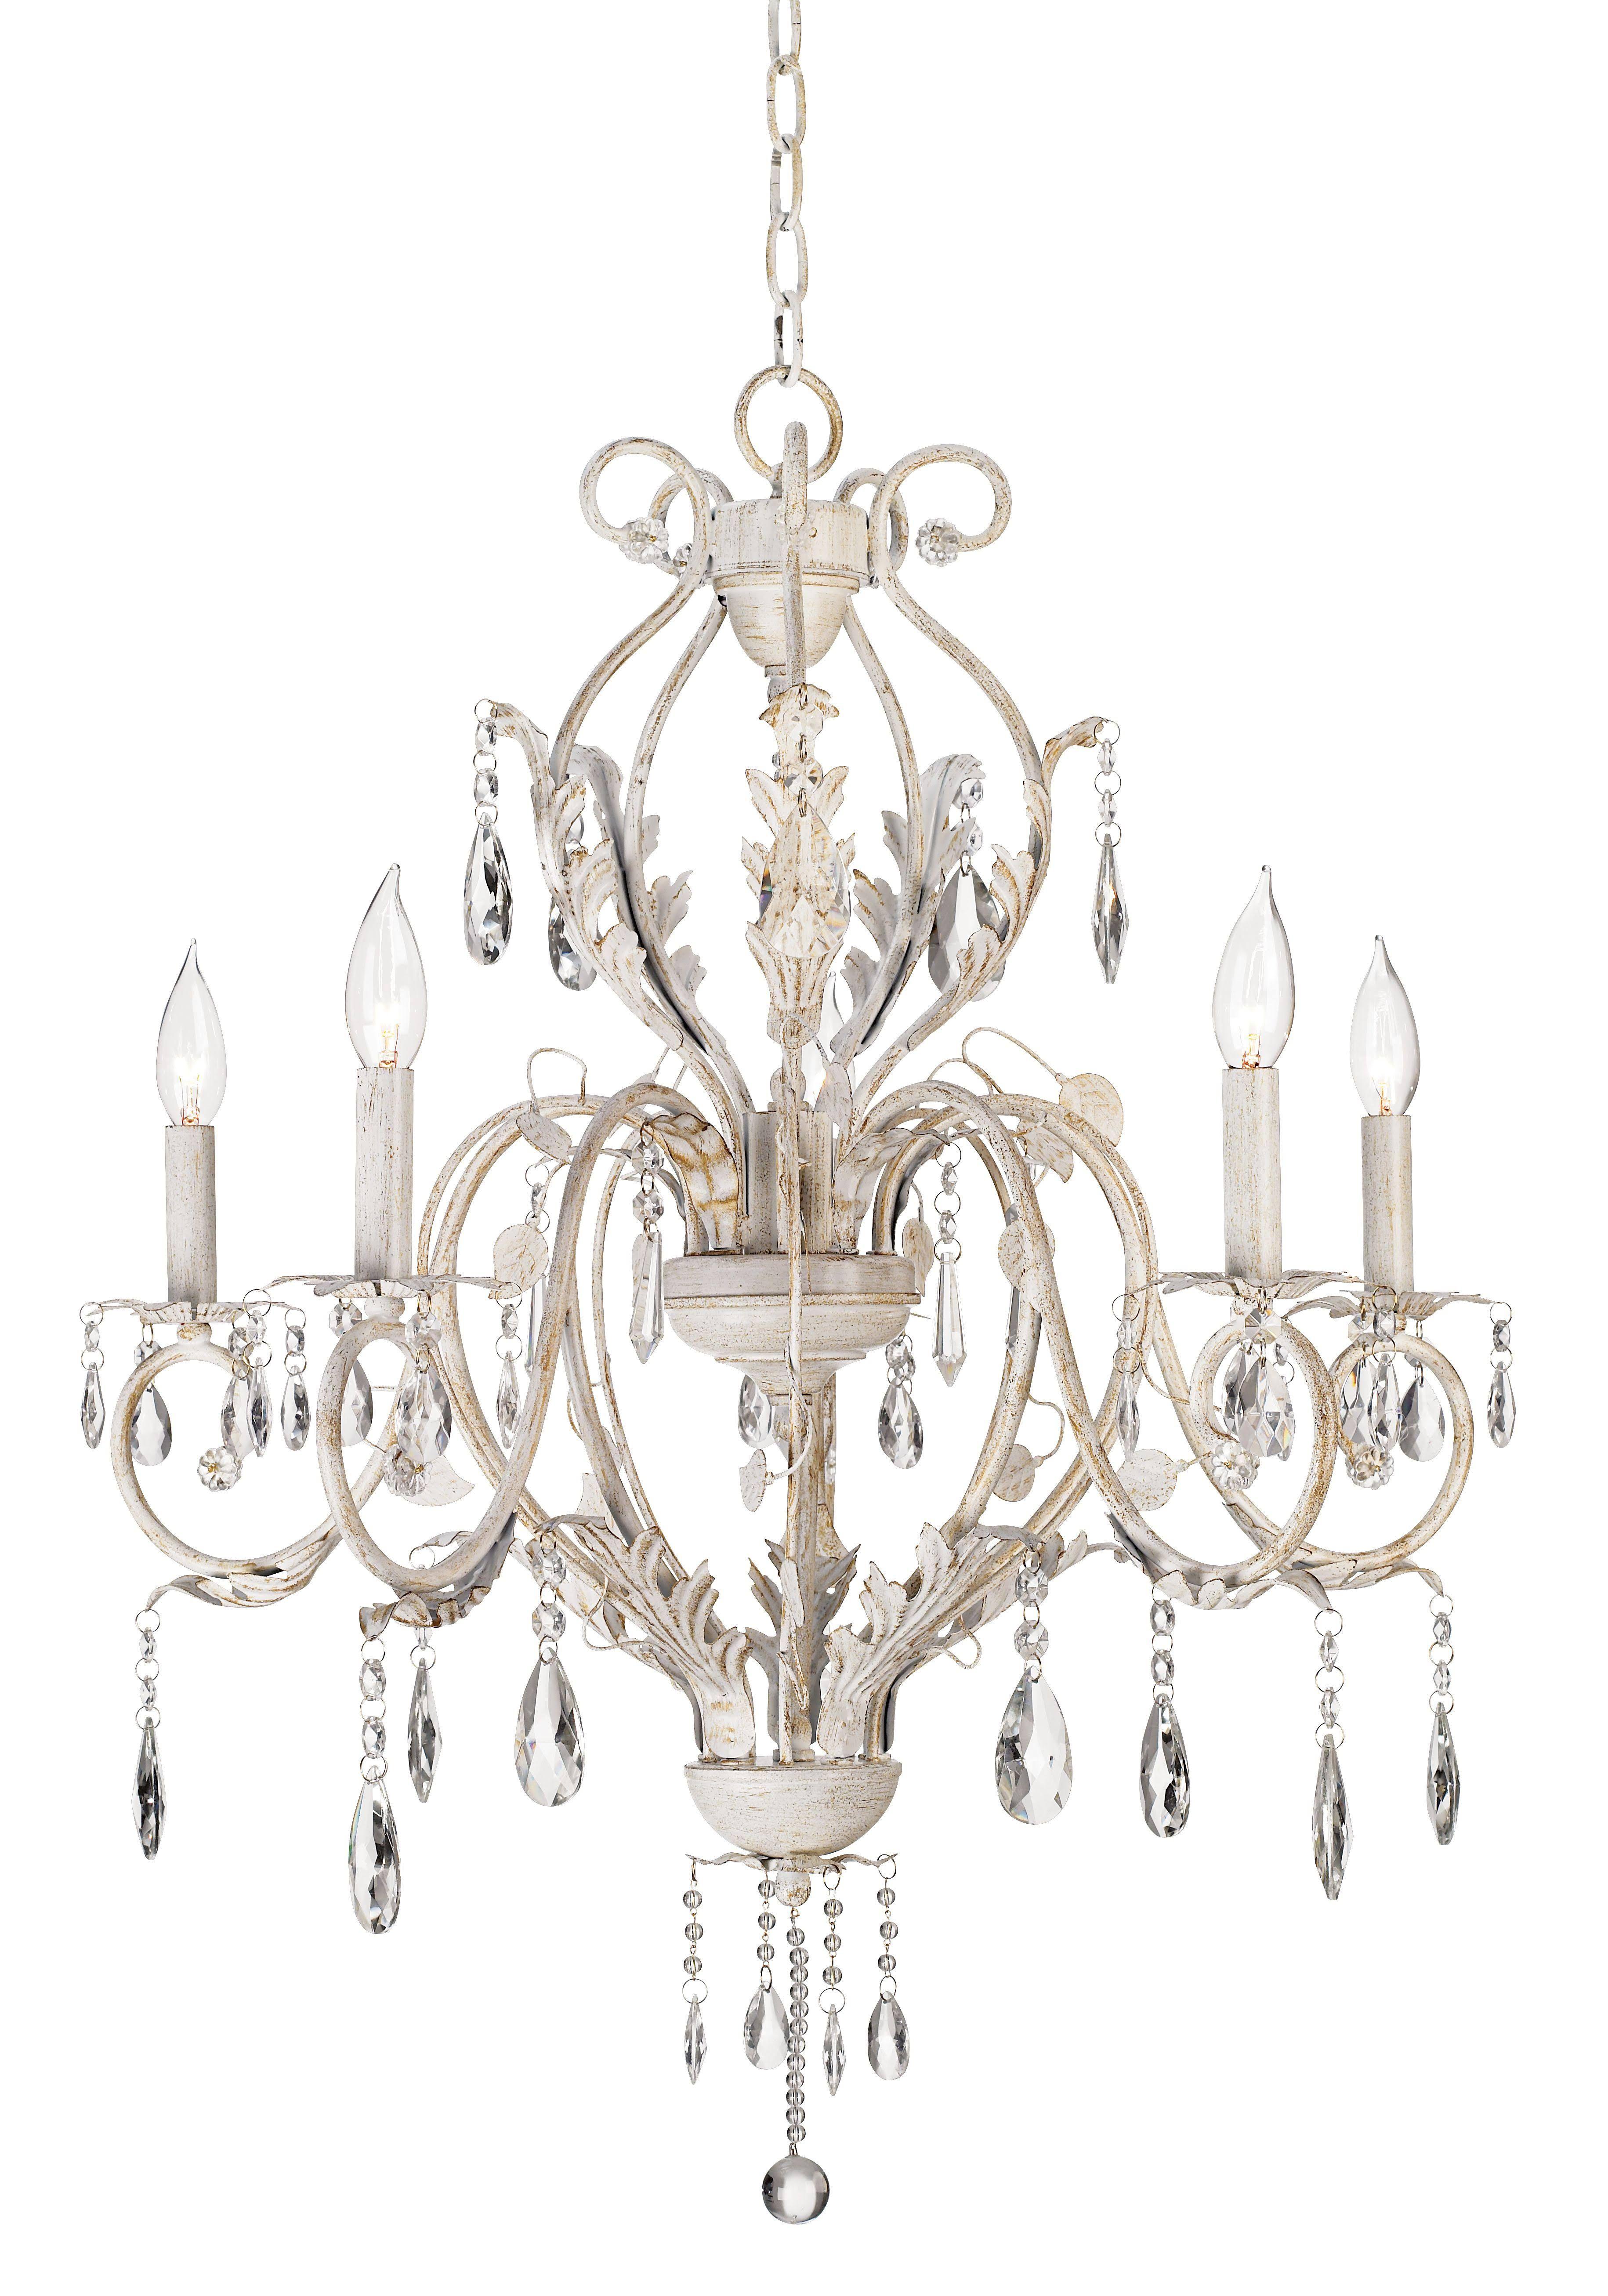 399 kathy ireland devon 5 light antique white crystal chandelier 399 kathy ireland devon 5 light antique white crystal chandelier 76475 arubaitofo Gallery